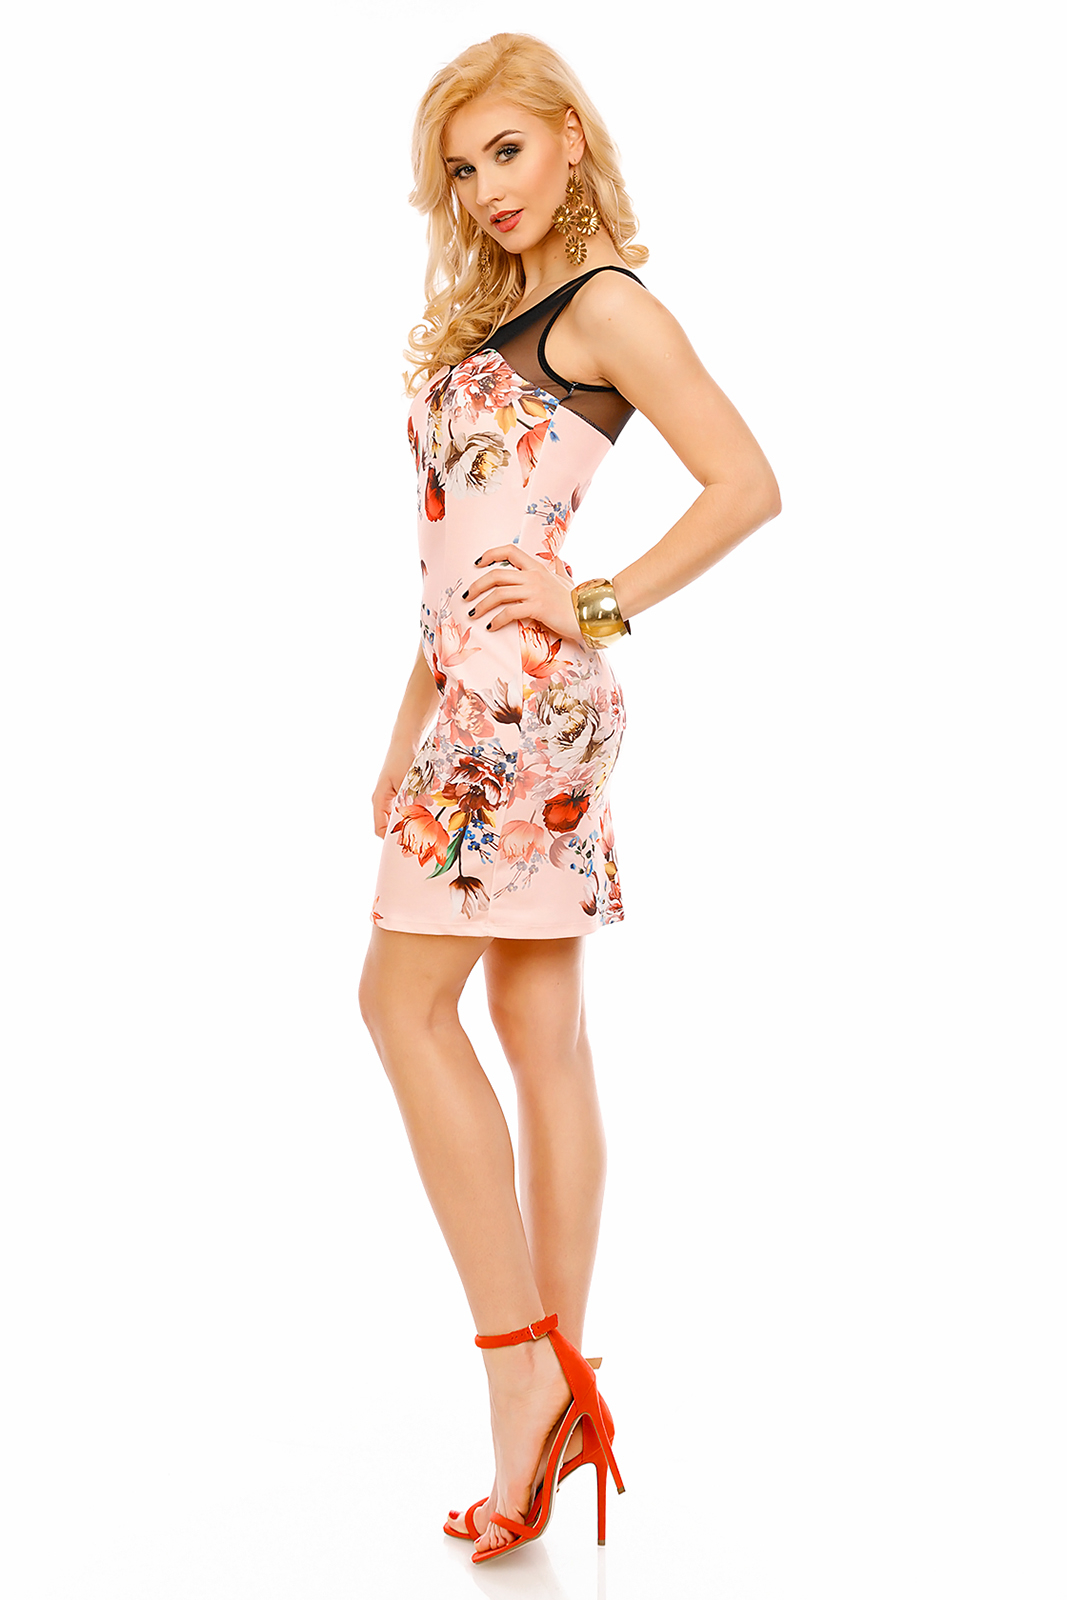 Spoločenské a párty šaty značkové vypasované bez rukávu ružové - Ružová / UNI - Made in ITALY UNI